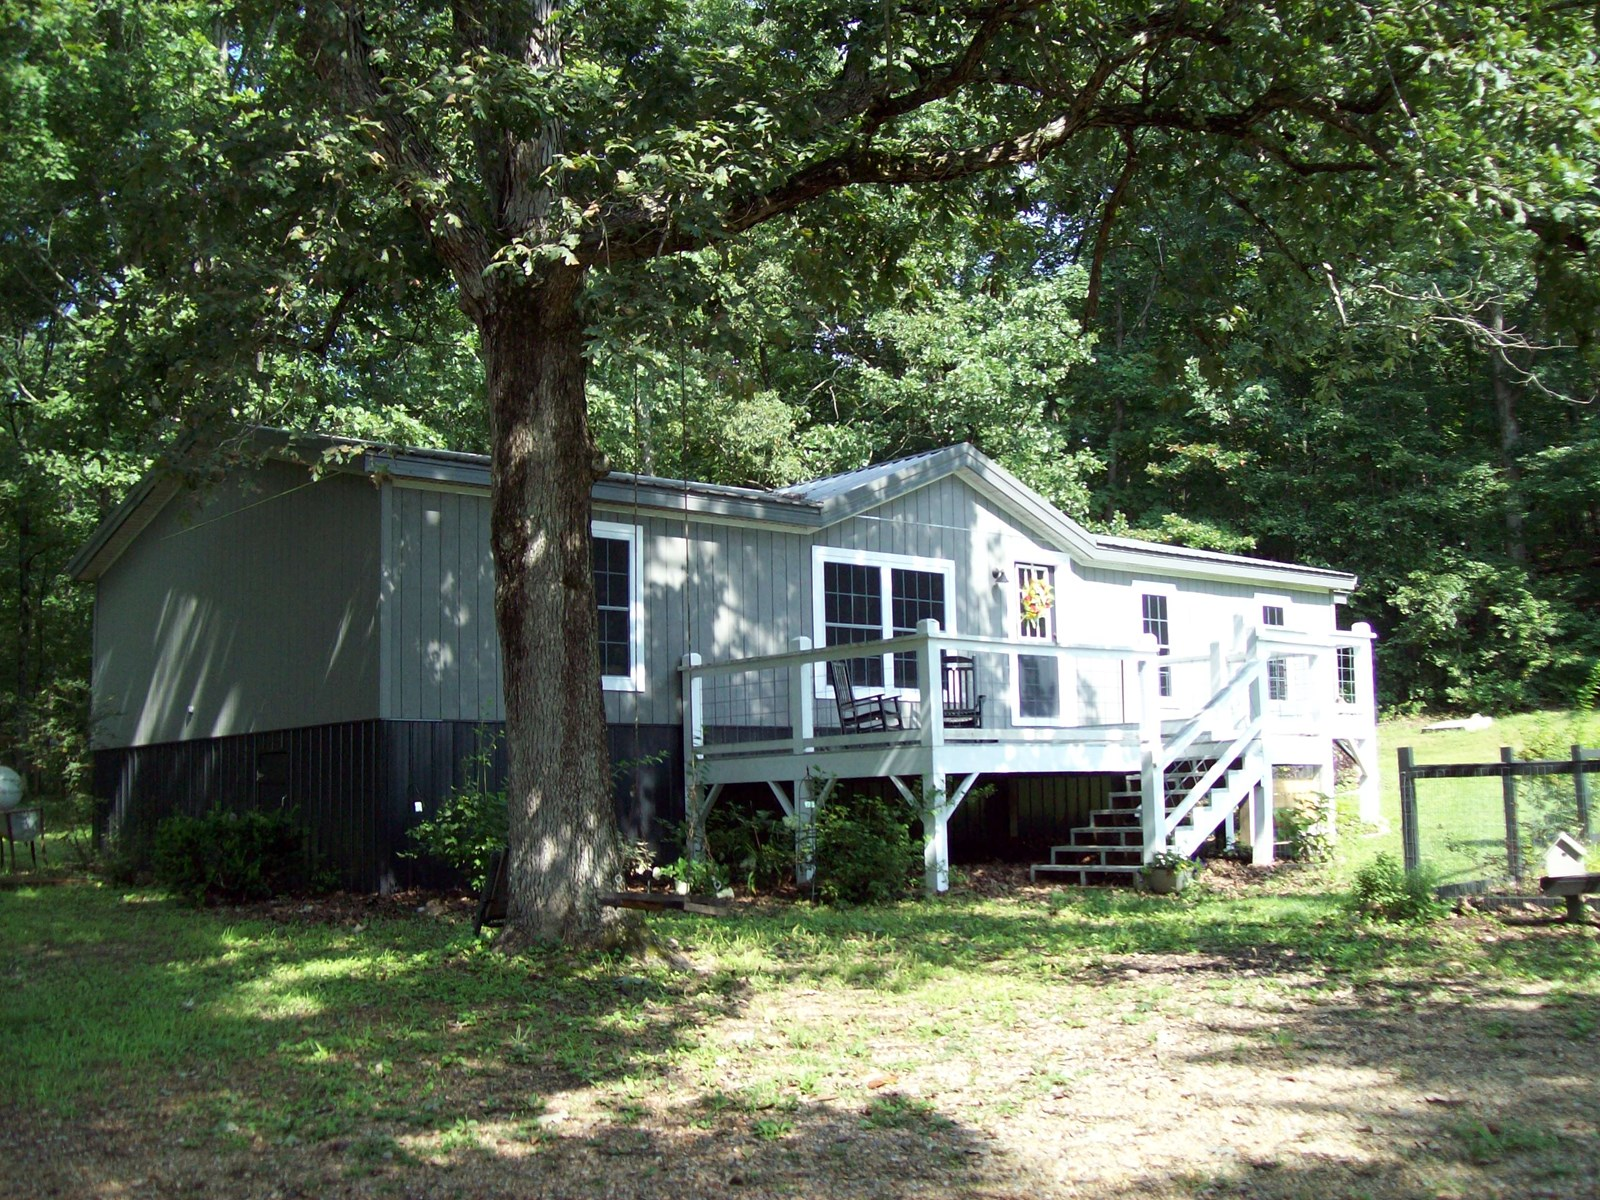 30 +/- Acres & Modular Home South of Annapolis